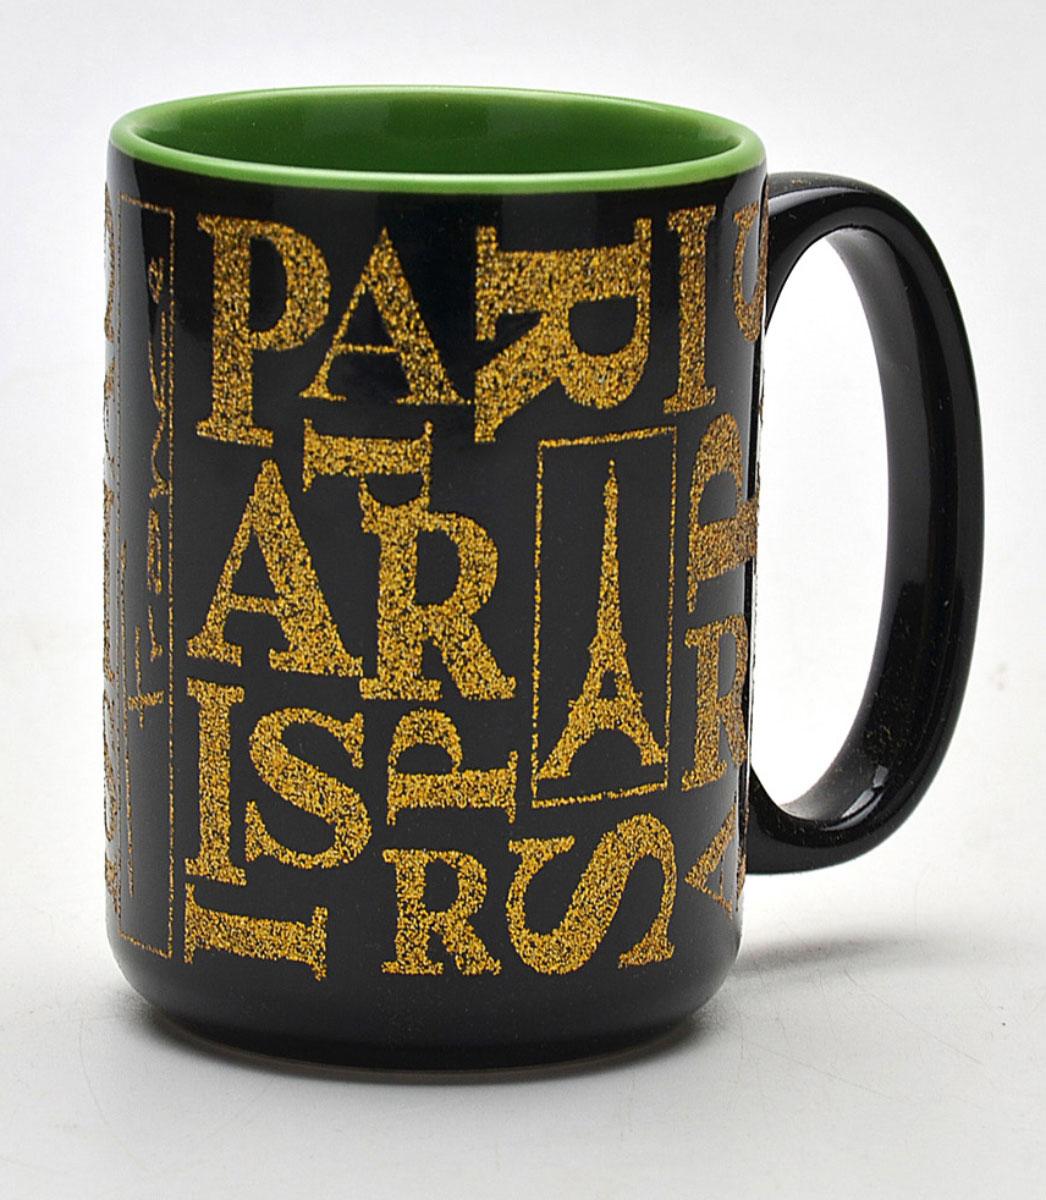 Кружка сувенирная Loraine Санкт-Петербург, 400 мл720Материал: керамика.